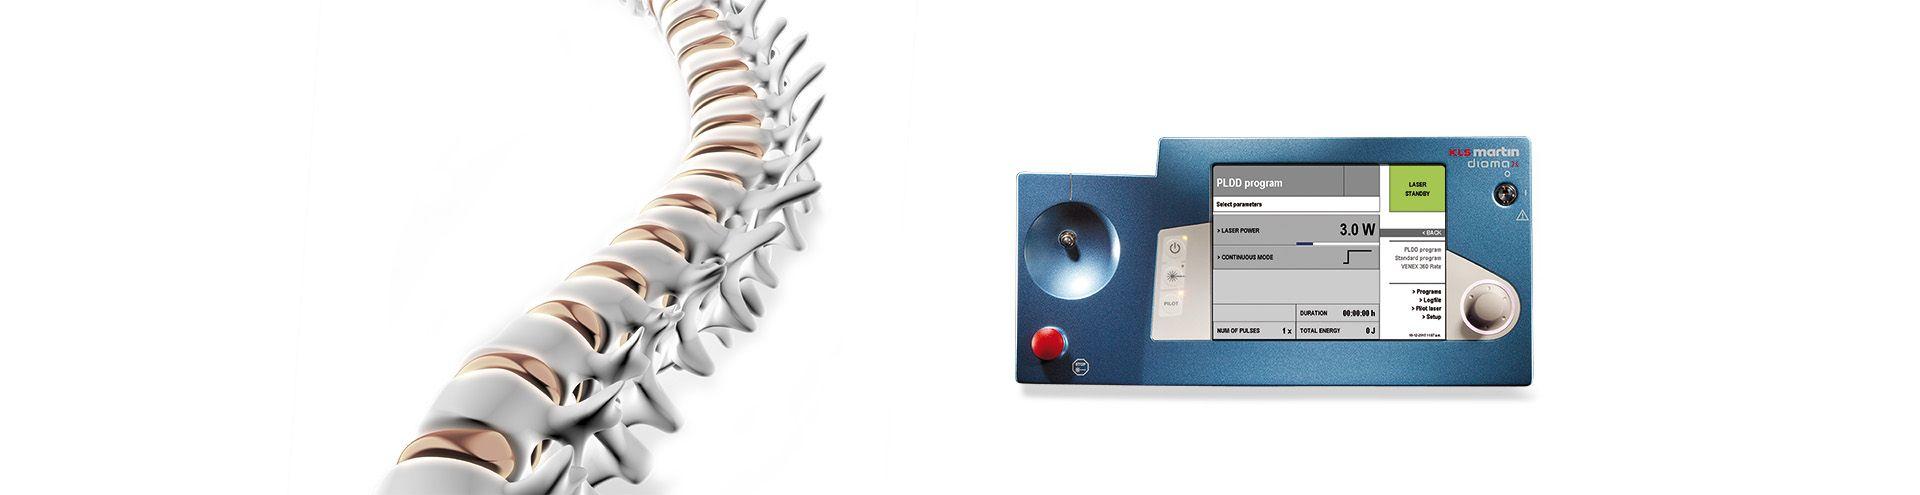 Sistemas láser quirúrgicos DPDL